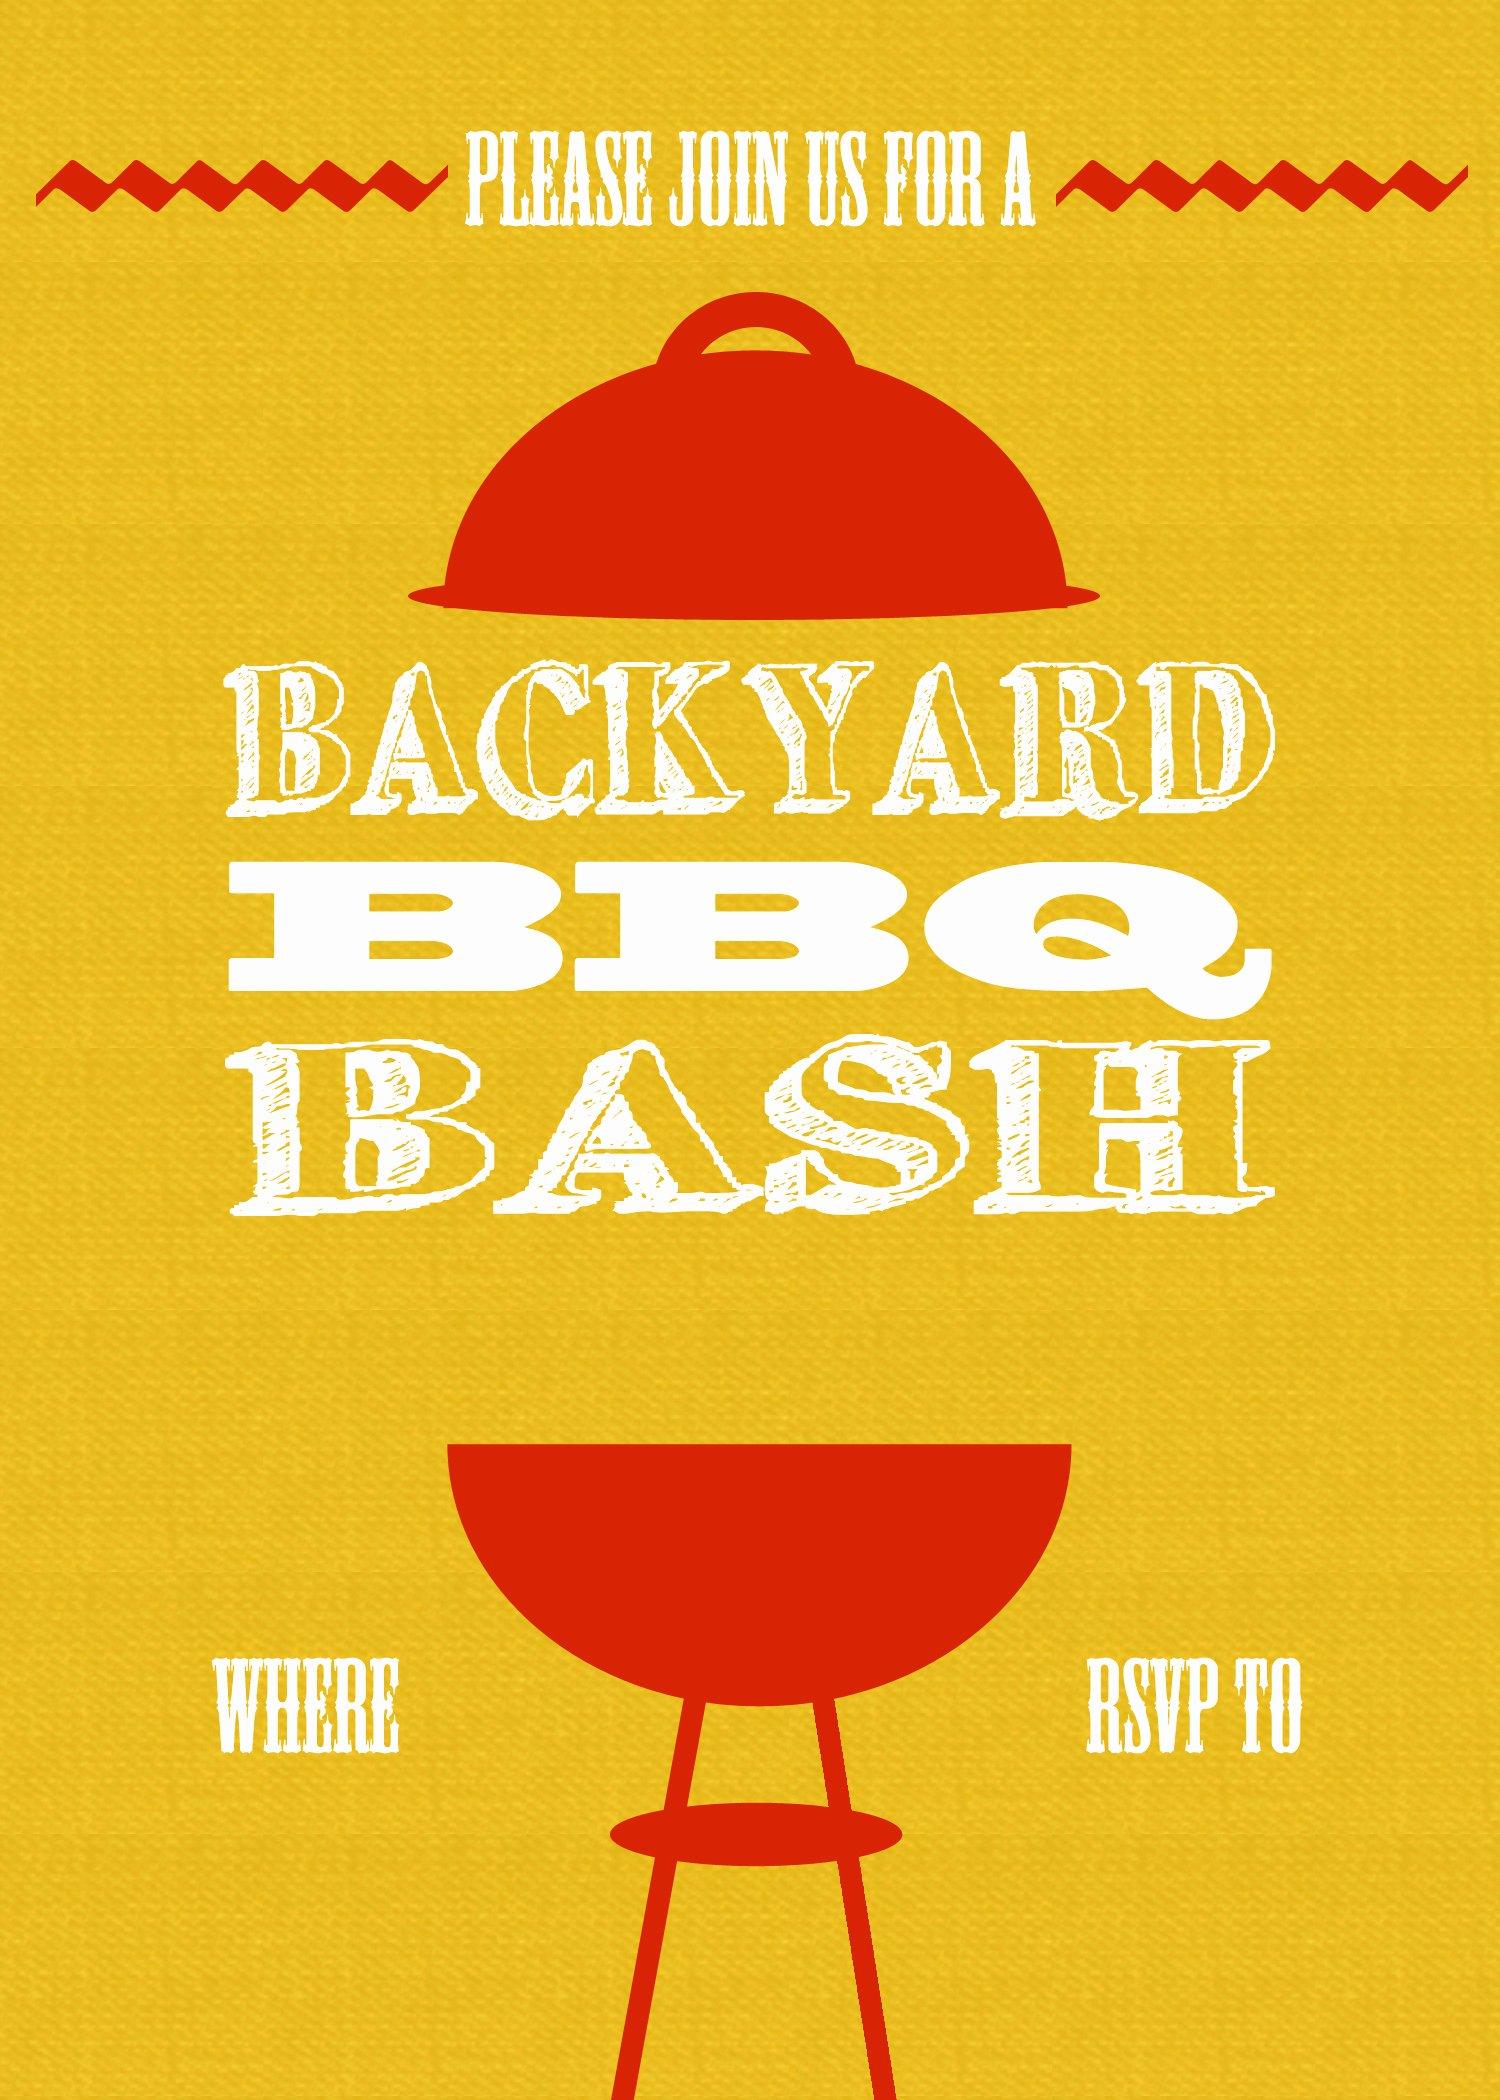 Bbq Invitation Template Word Lovely Diy Printable Backyard Bbq Bash Invite